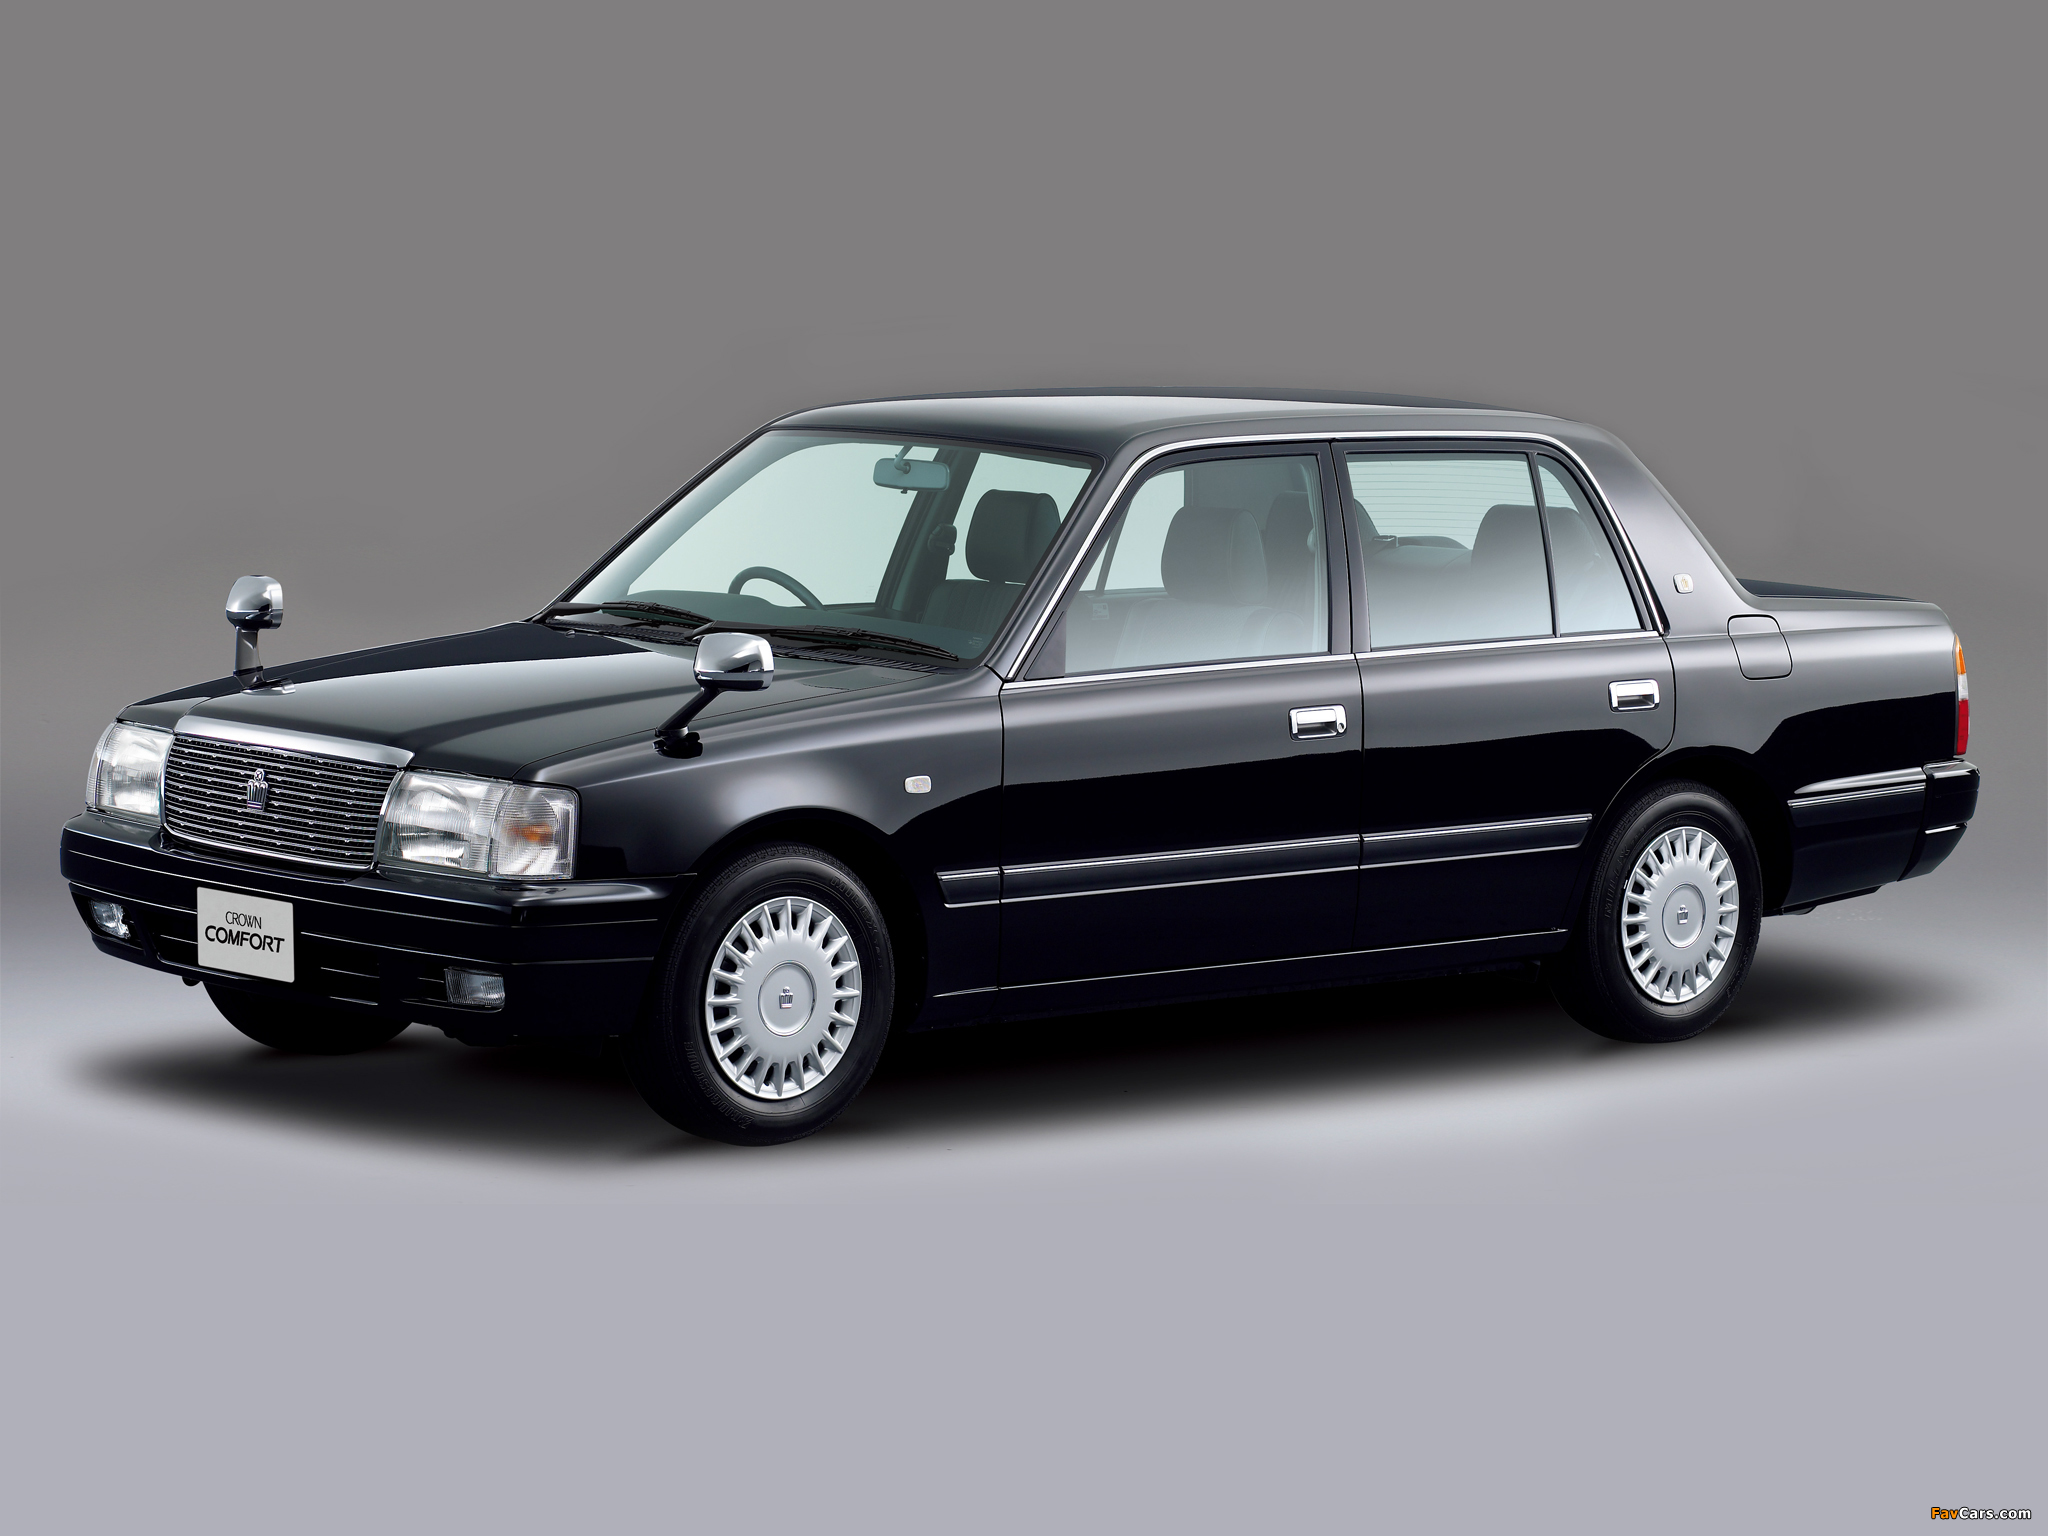 Toyota Crown Comfort (S10) 1995 photos (2048 x 1536)